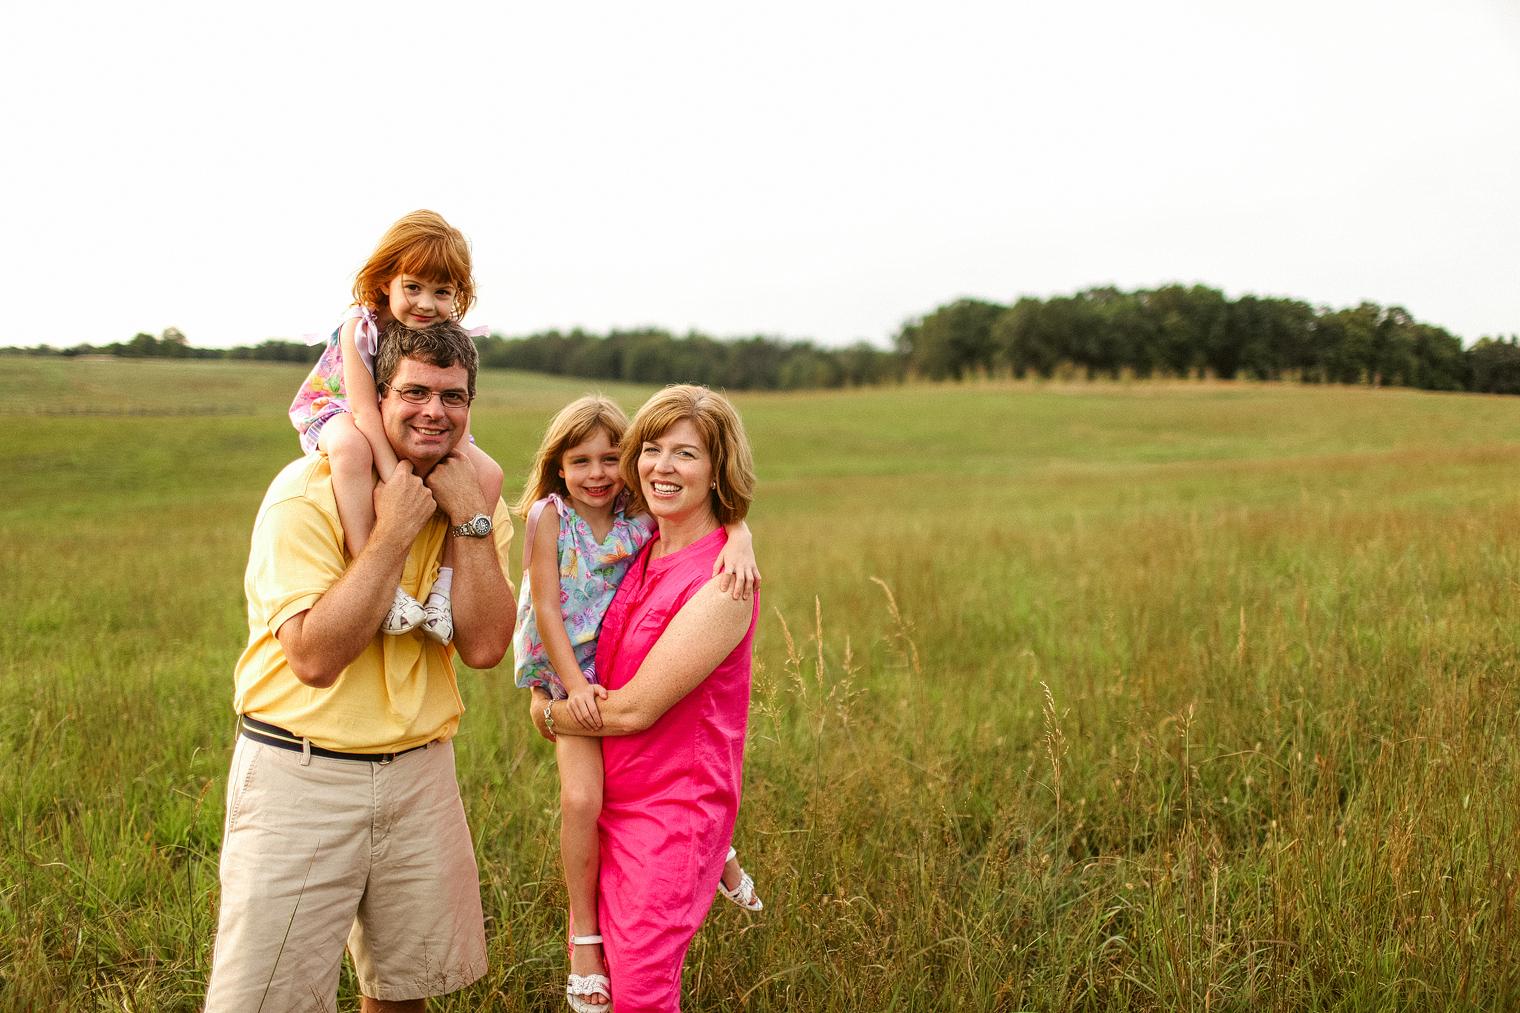 Manassas-Battlefield-Family-Photography013.jpg